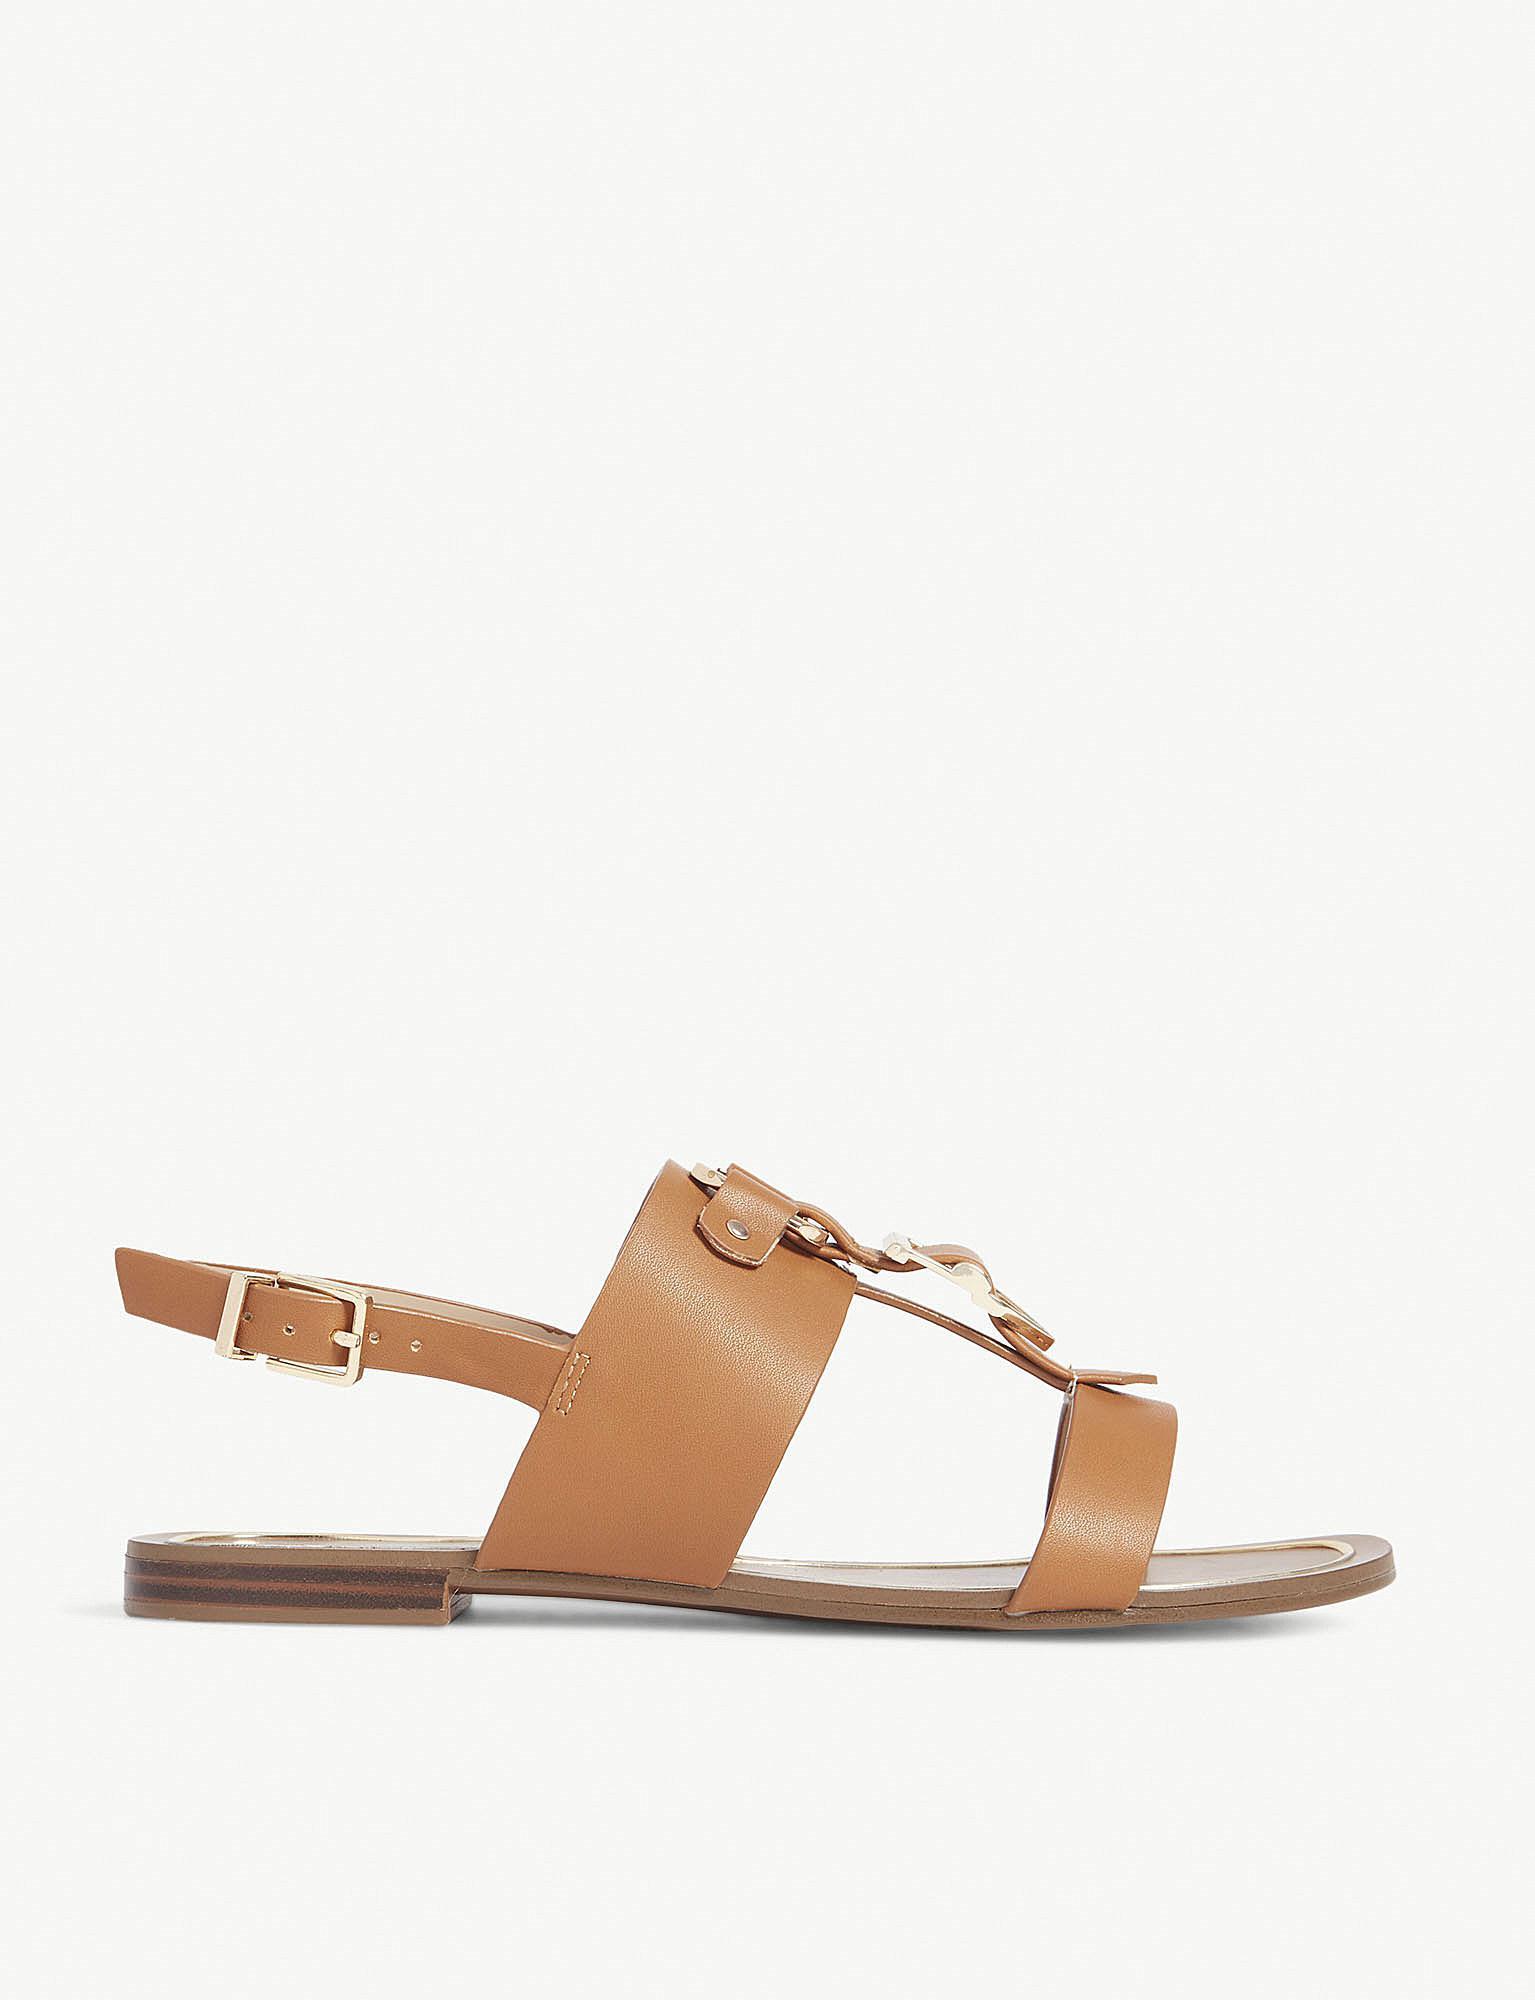 a2ed94b774be33 ALDO. Women s Natural Afiarien Buckle Sandals.  44 From Selfridges